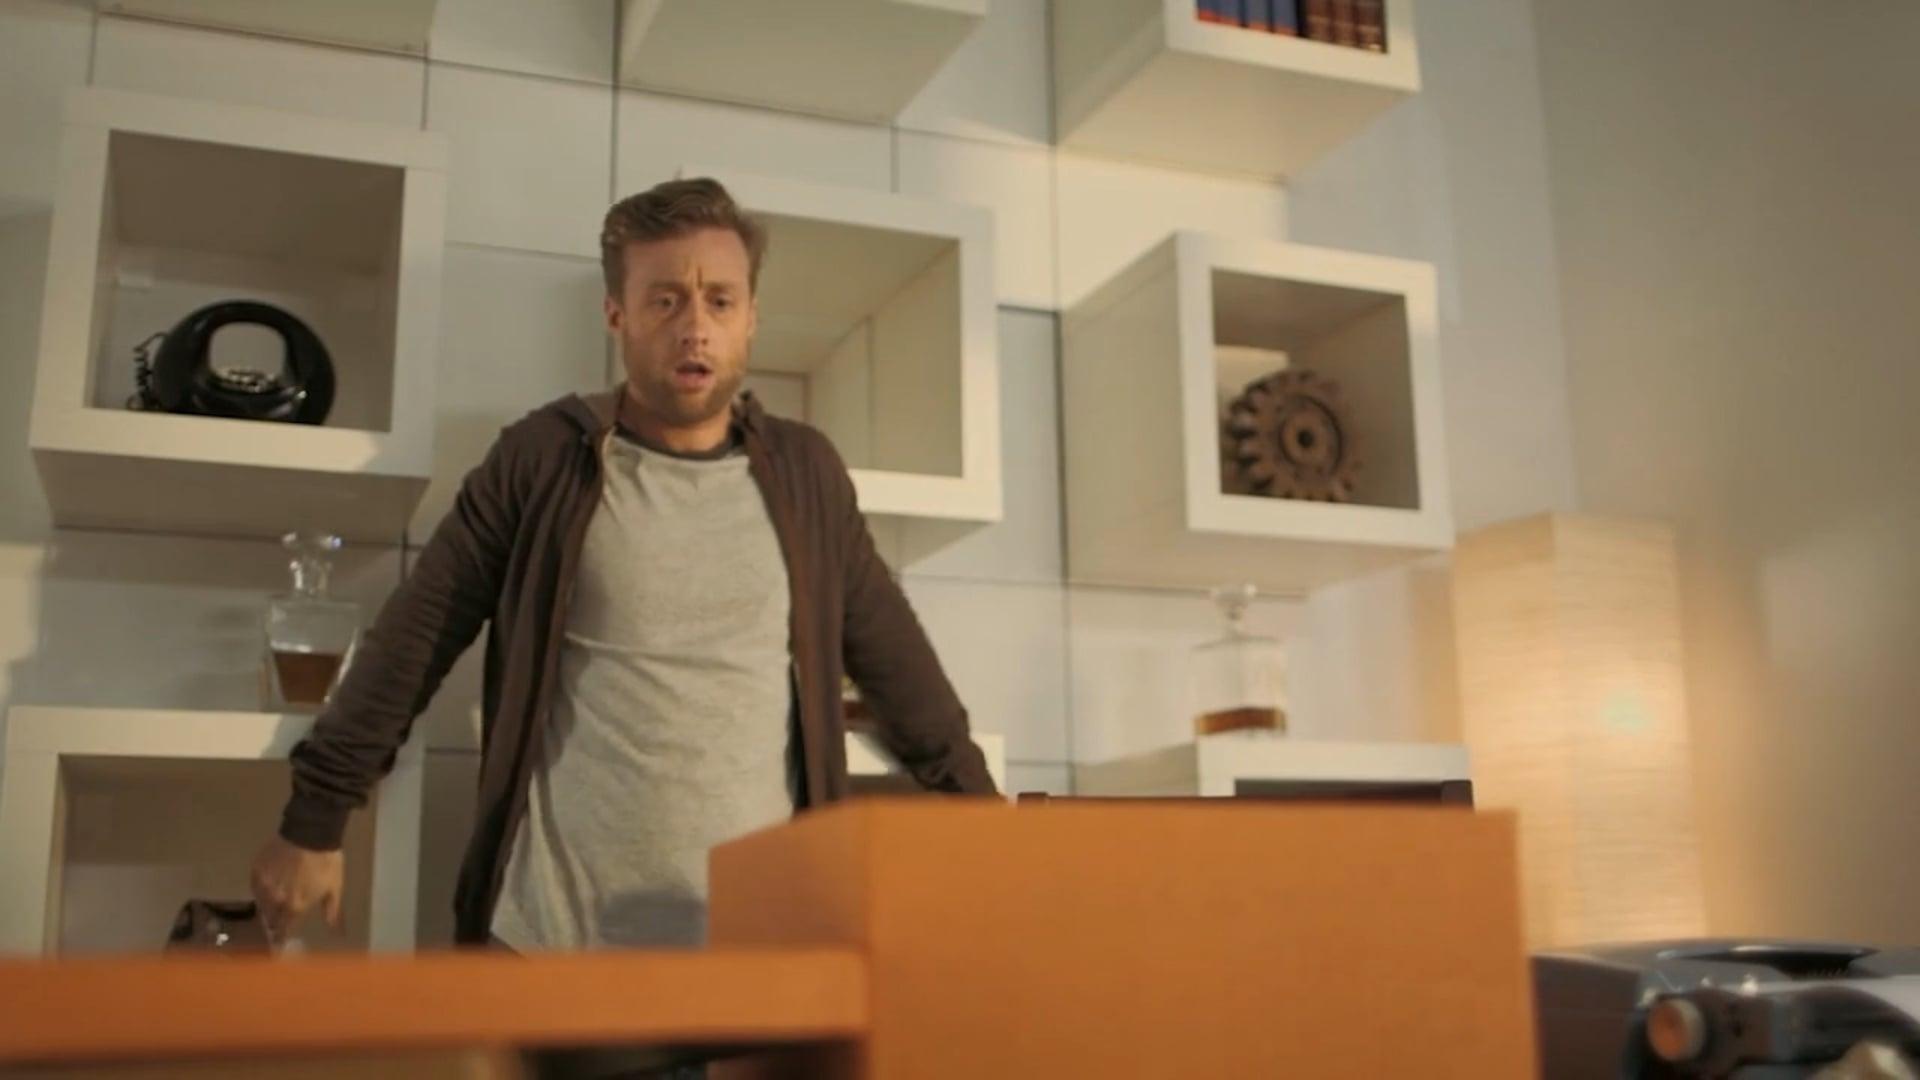 Jack in the Box - short film